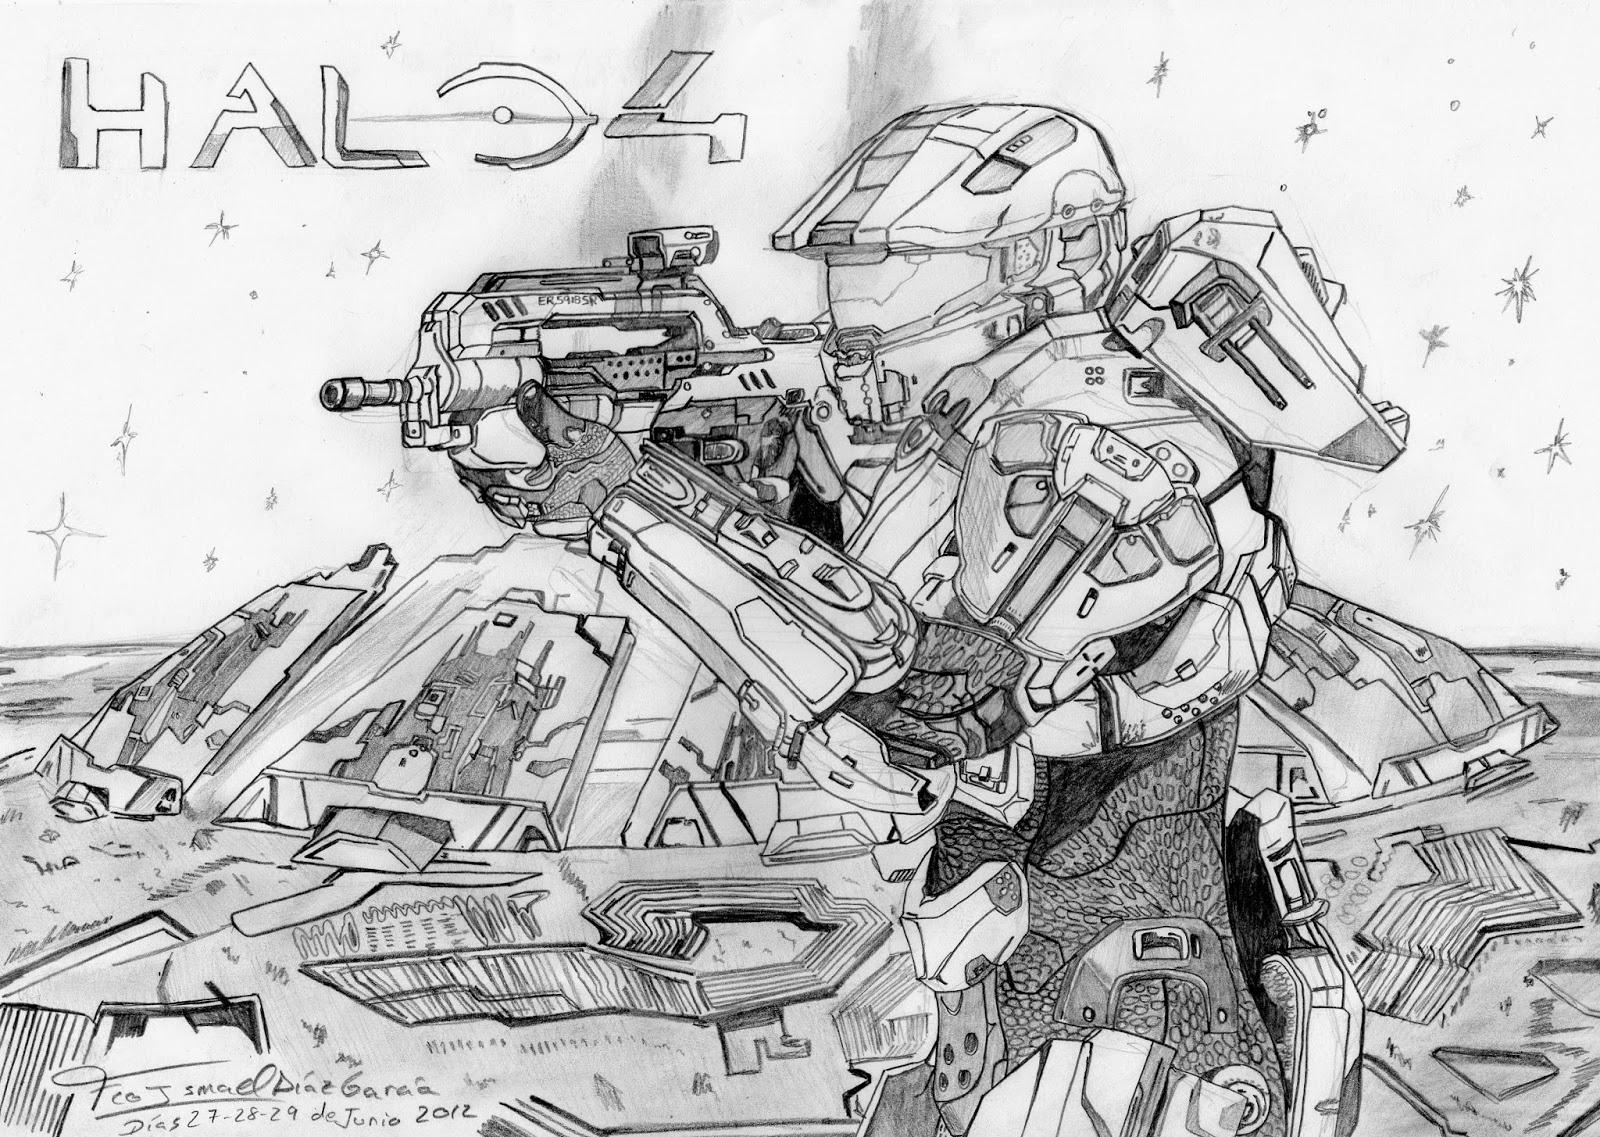 Halo 4 Dibujos Para Colorear - Dibujos Para Dibujar